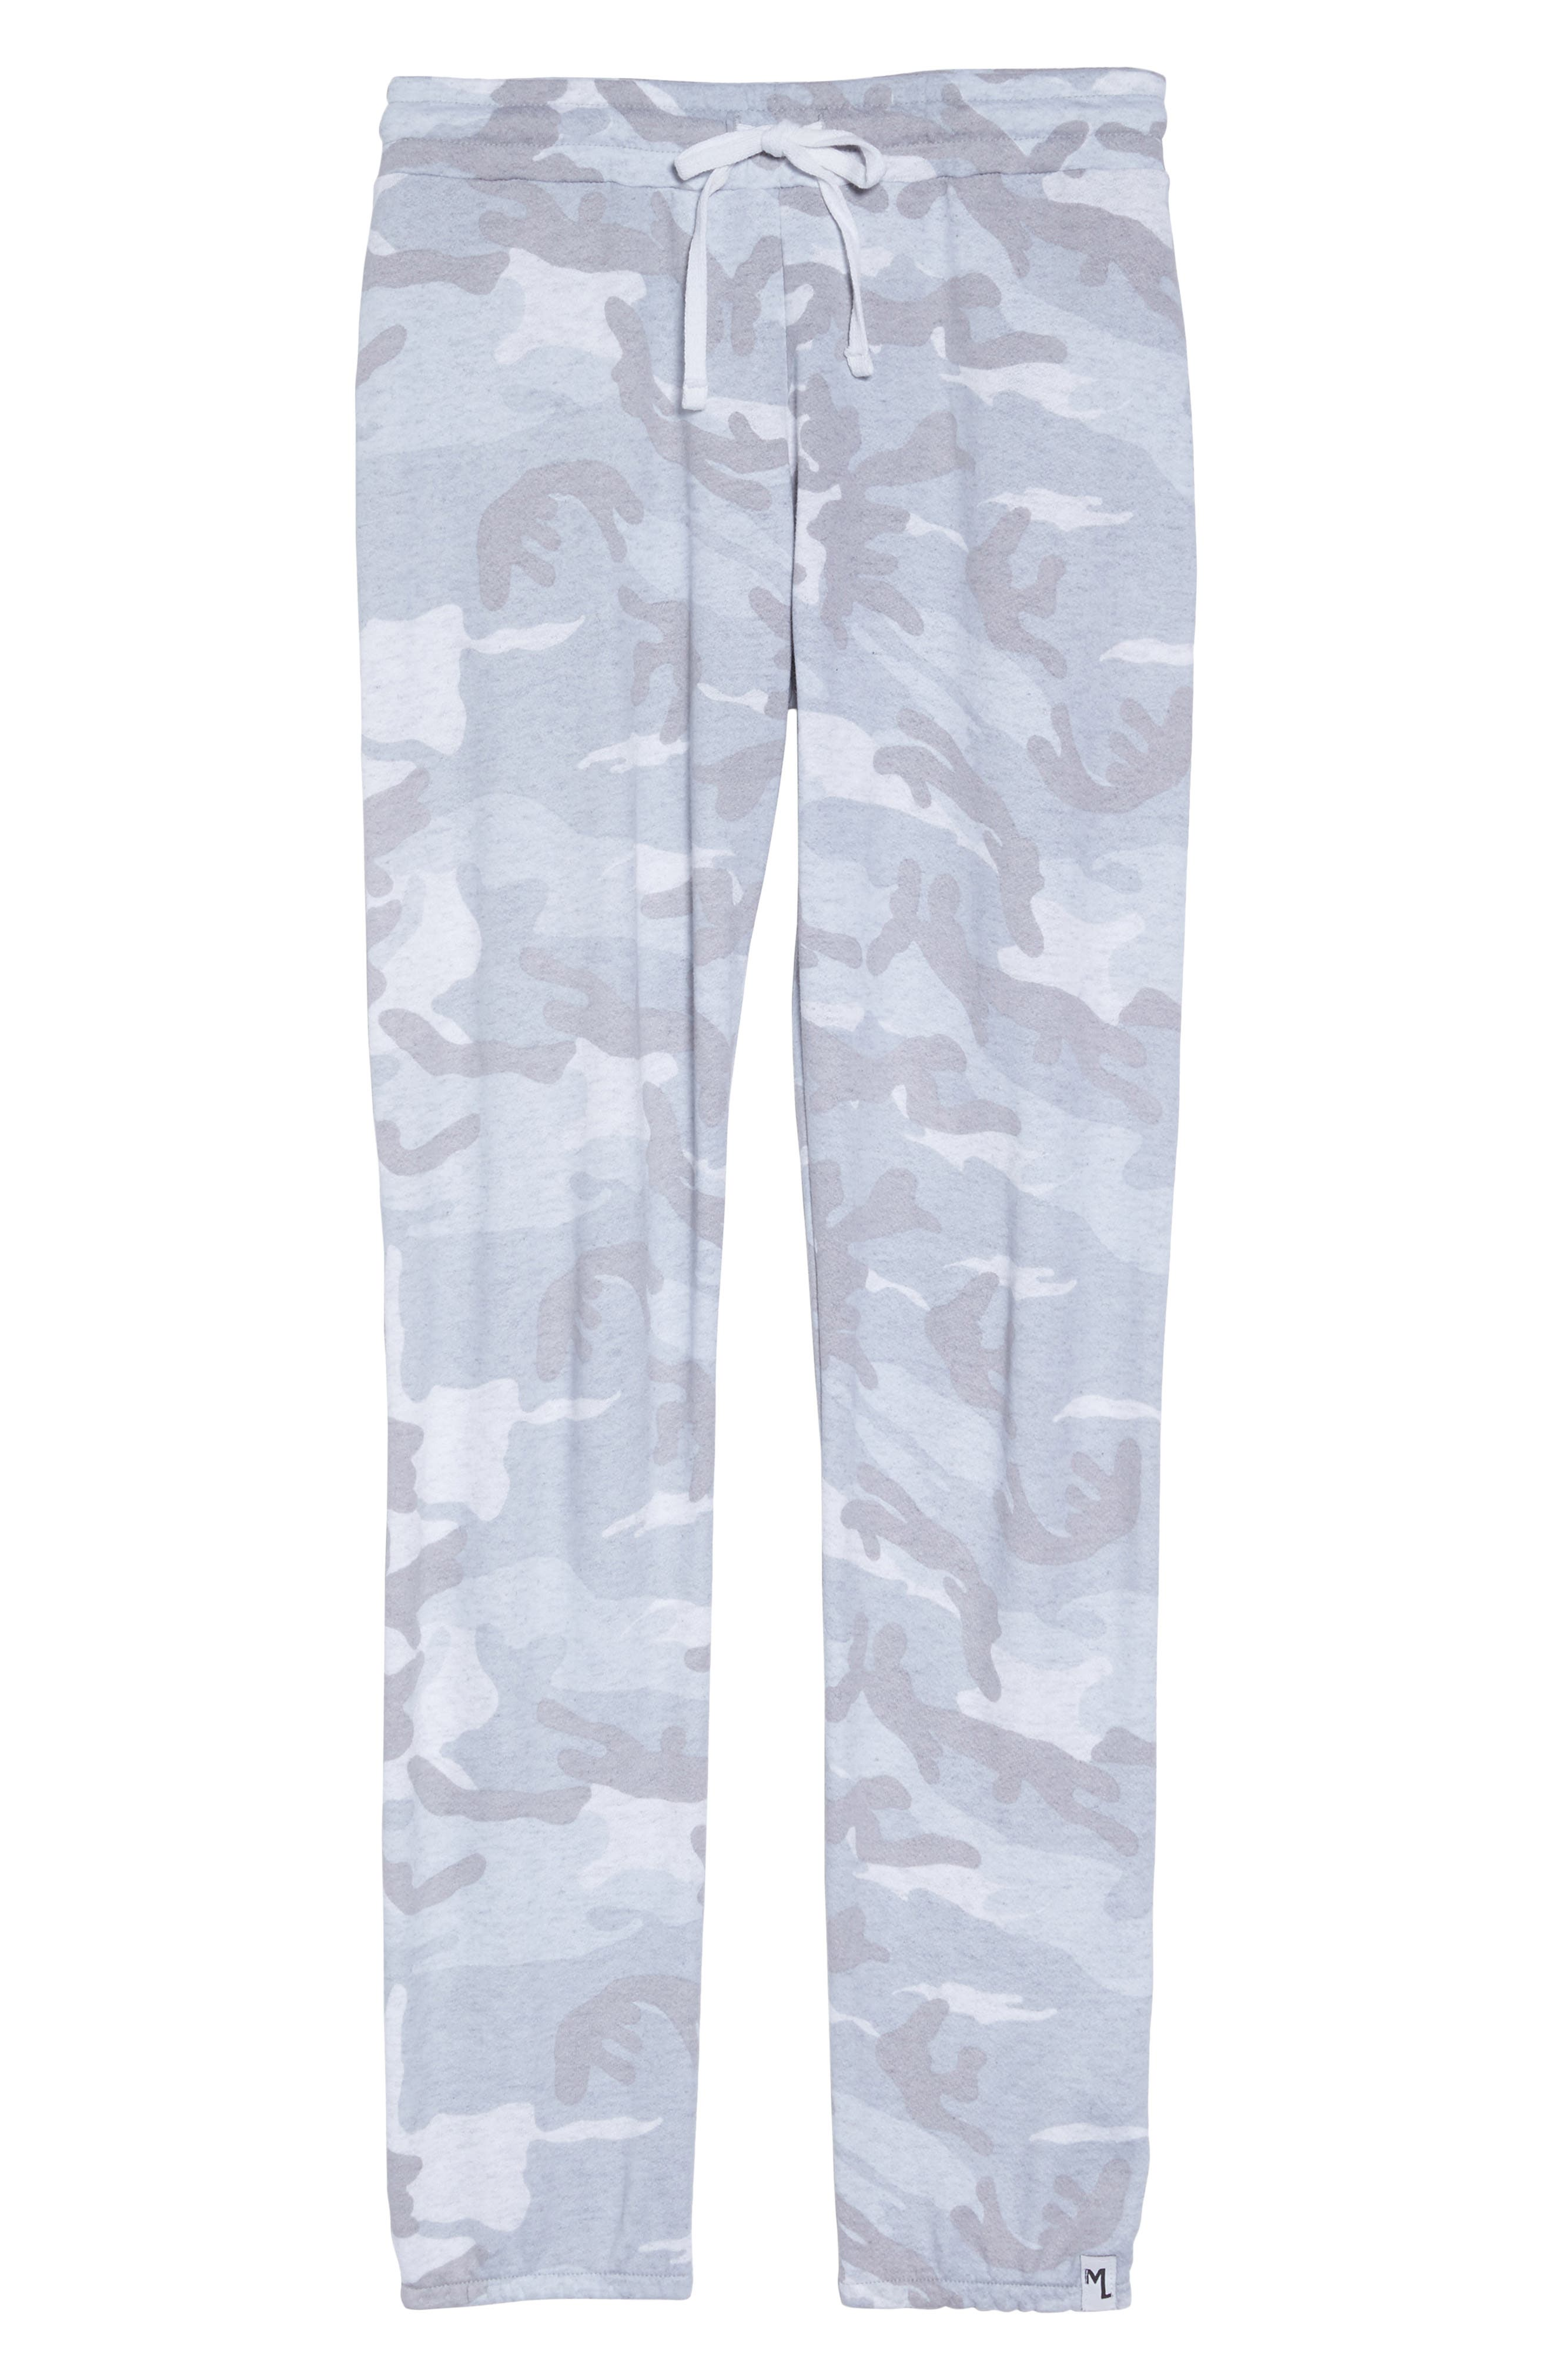 Campbell Vintage Jogger Pants,                             Alternate thumbnail 6, color,                             093